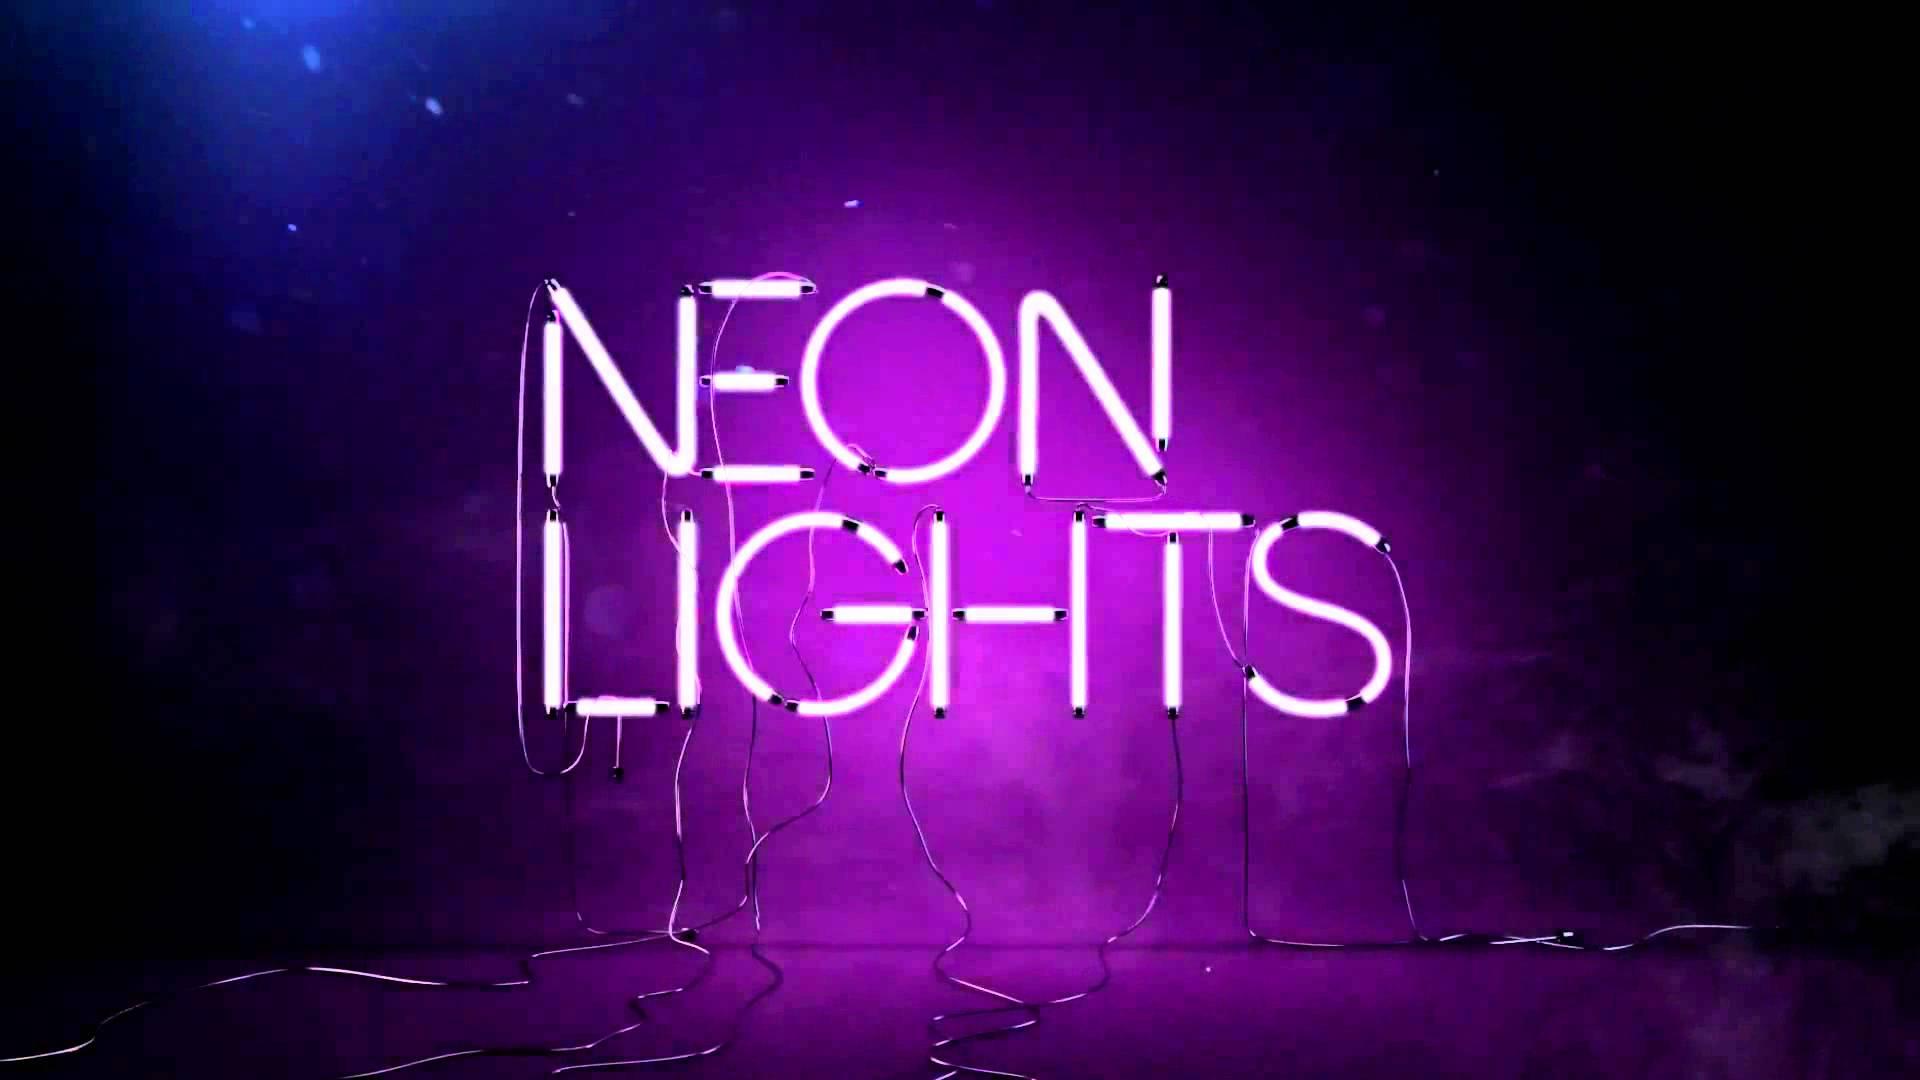 neon lights wallpaper - photo #42